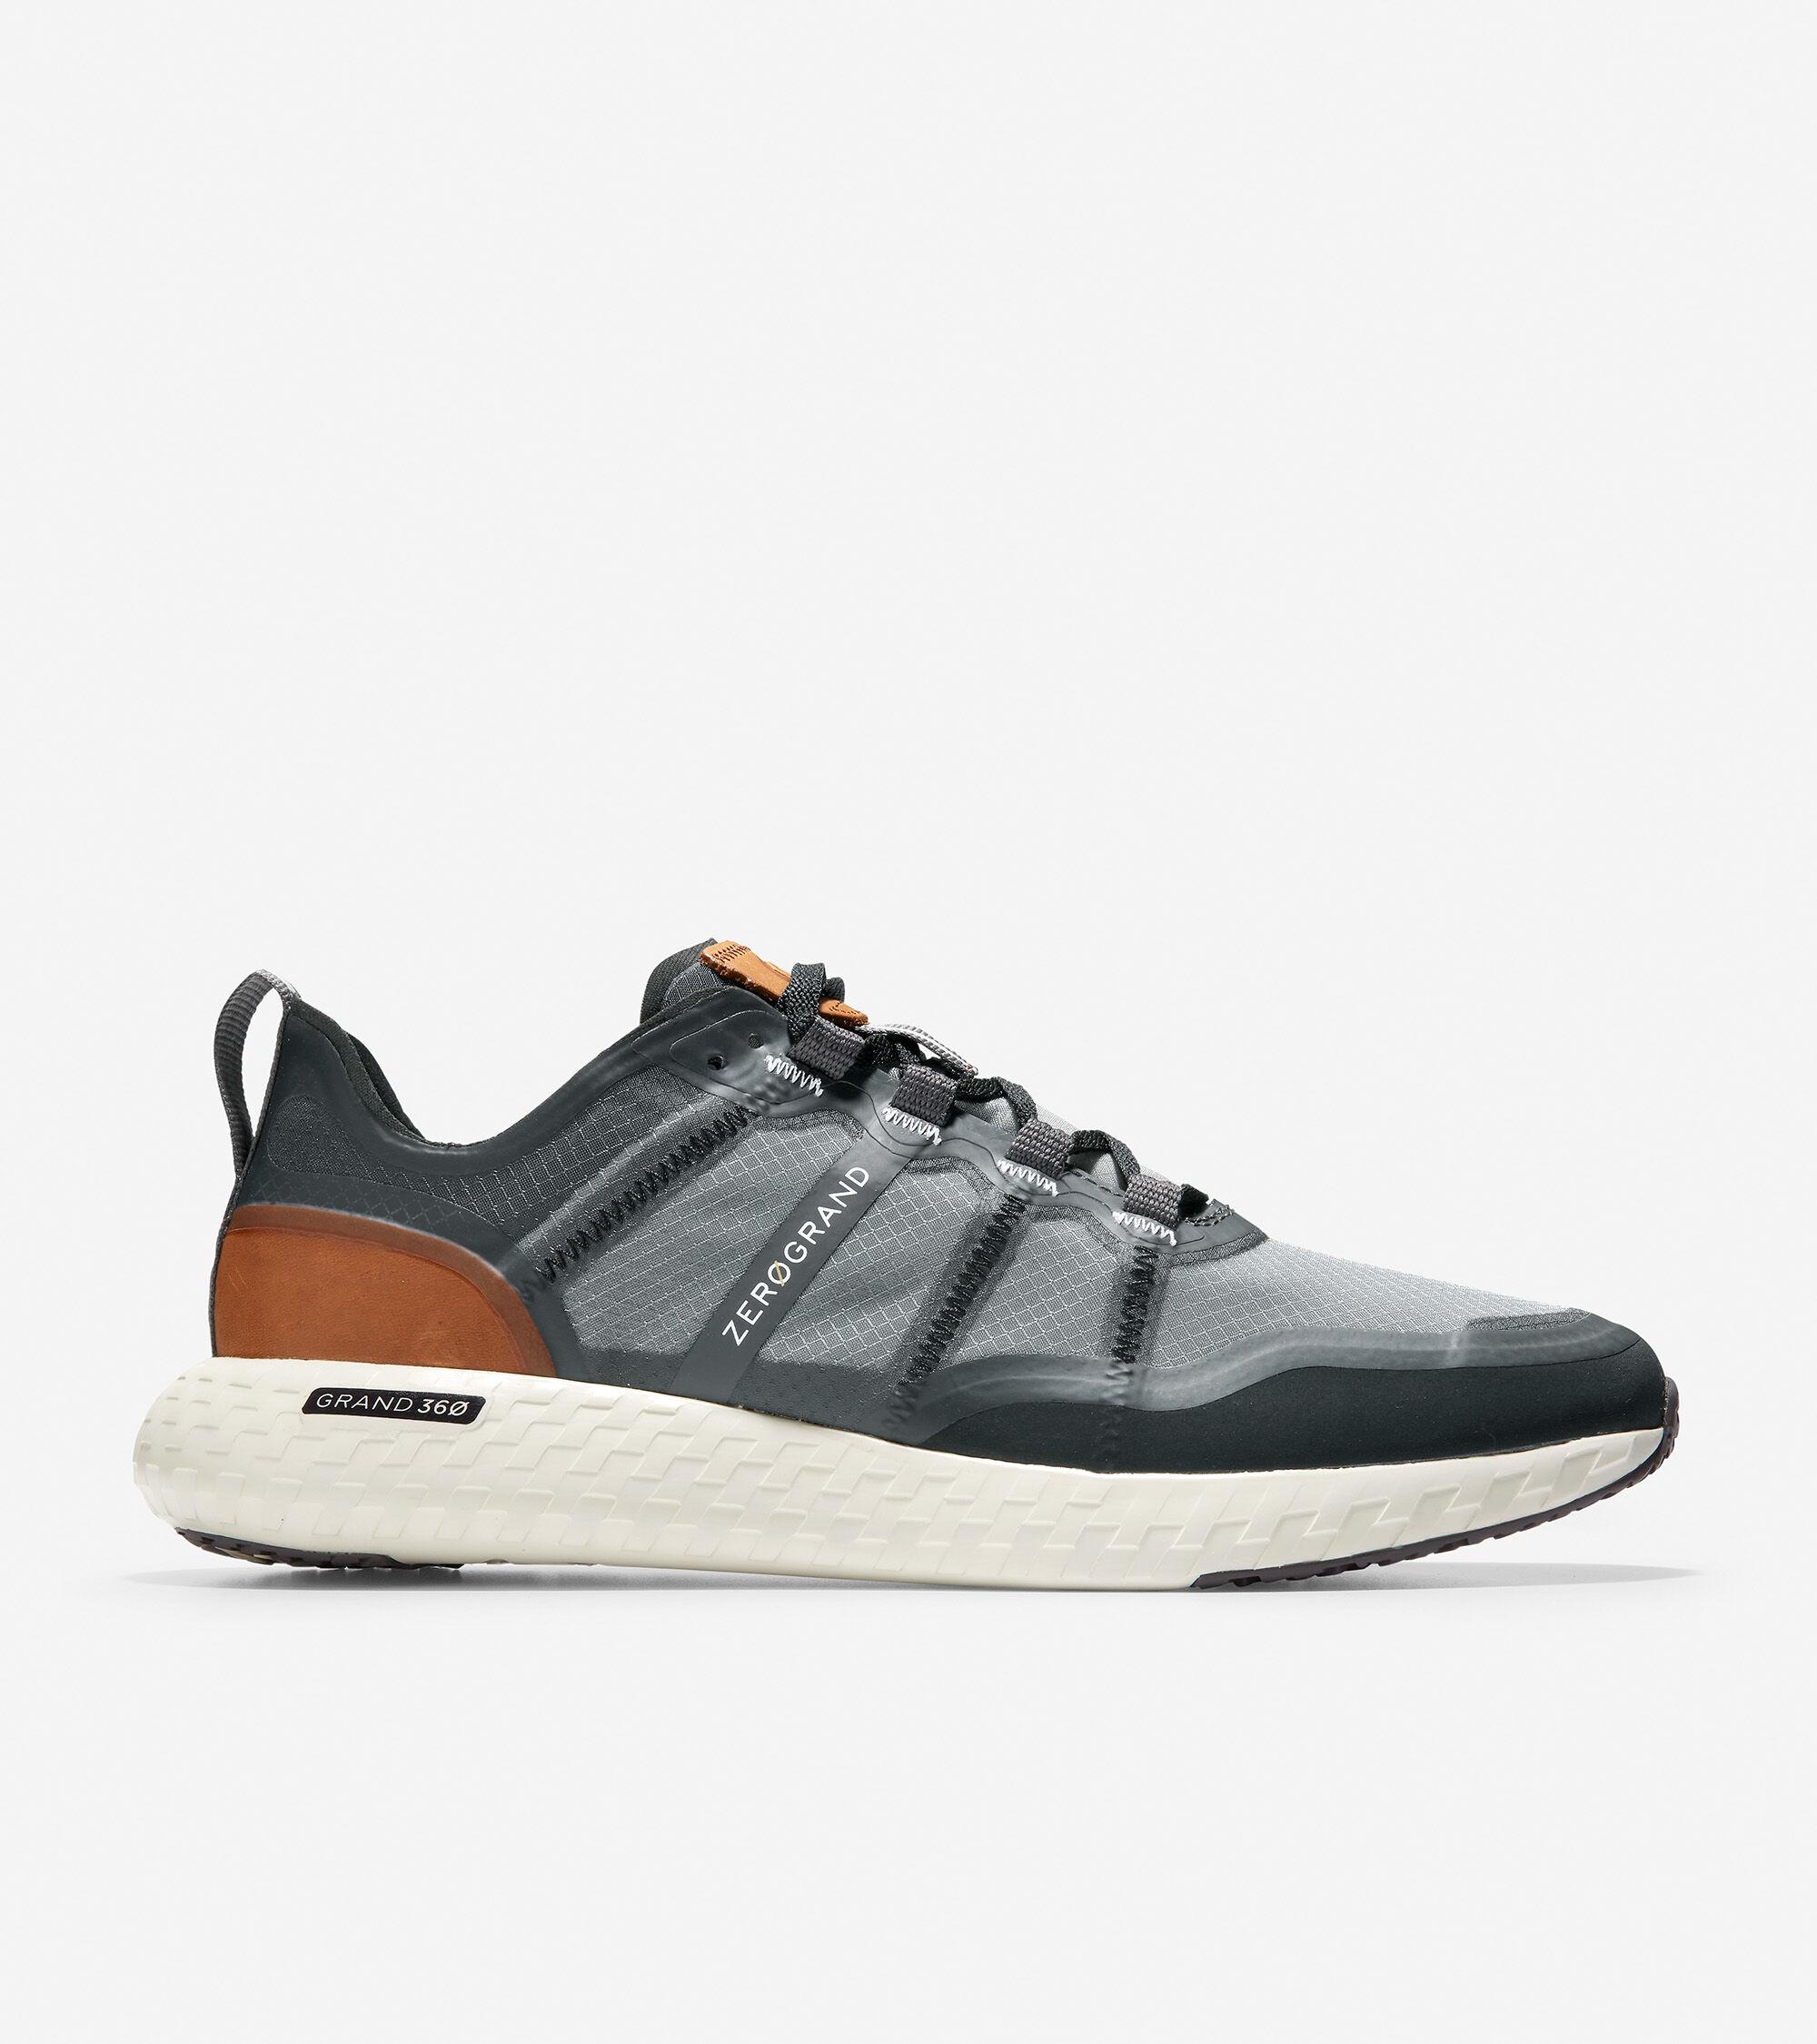 Men's ZERØGRAND Outpace Running Shoe in